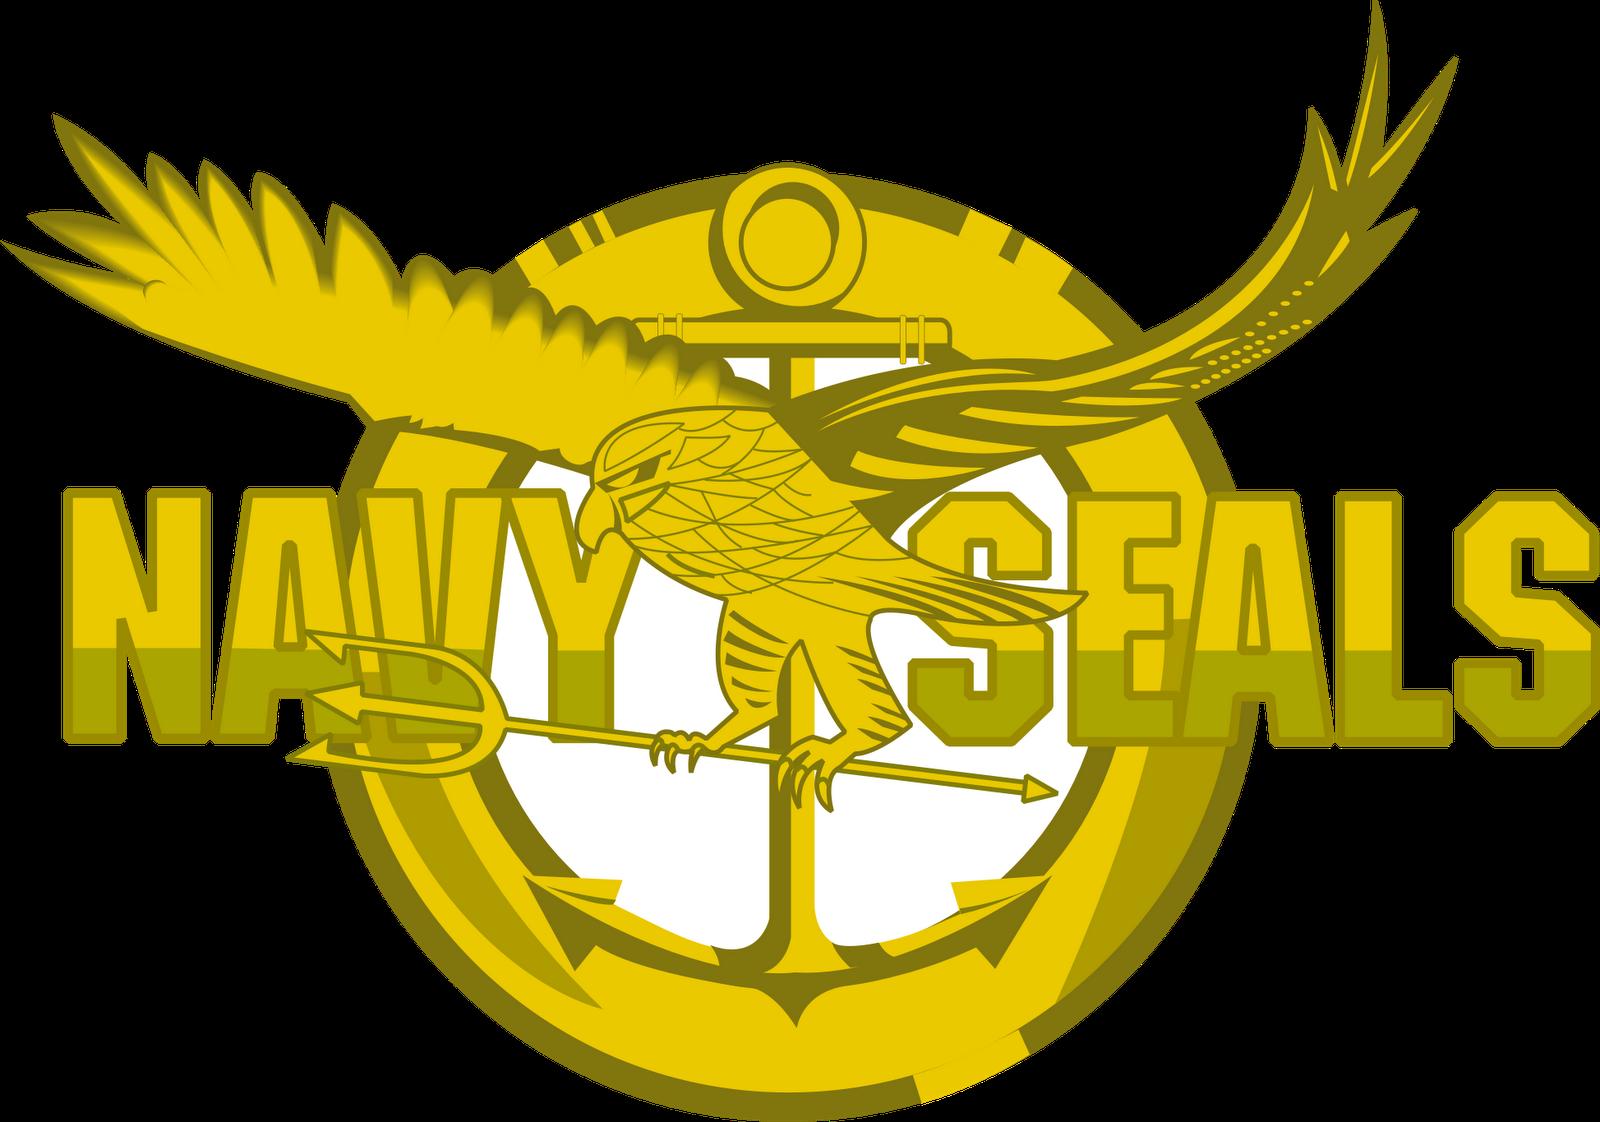 Seals logo wallpaper pinterest. Navy clipart trident